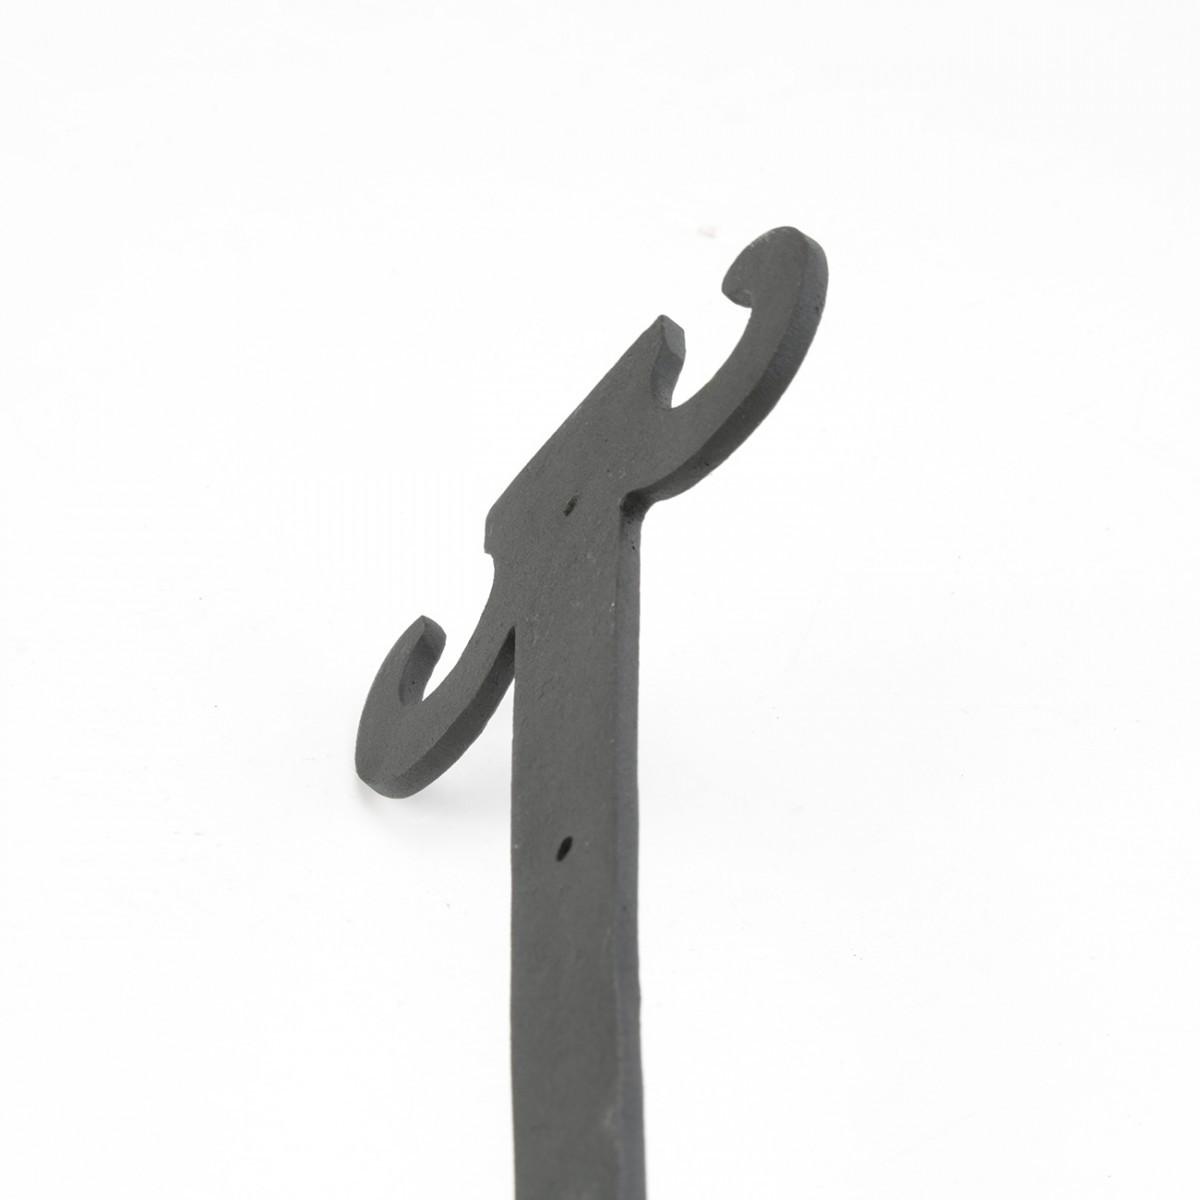 4 Hinge Covers Black Wrought Iron Dummy Hinge Fleur Set of 4 | RS Door Hinges Door Hinge